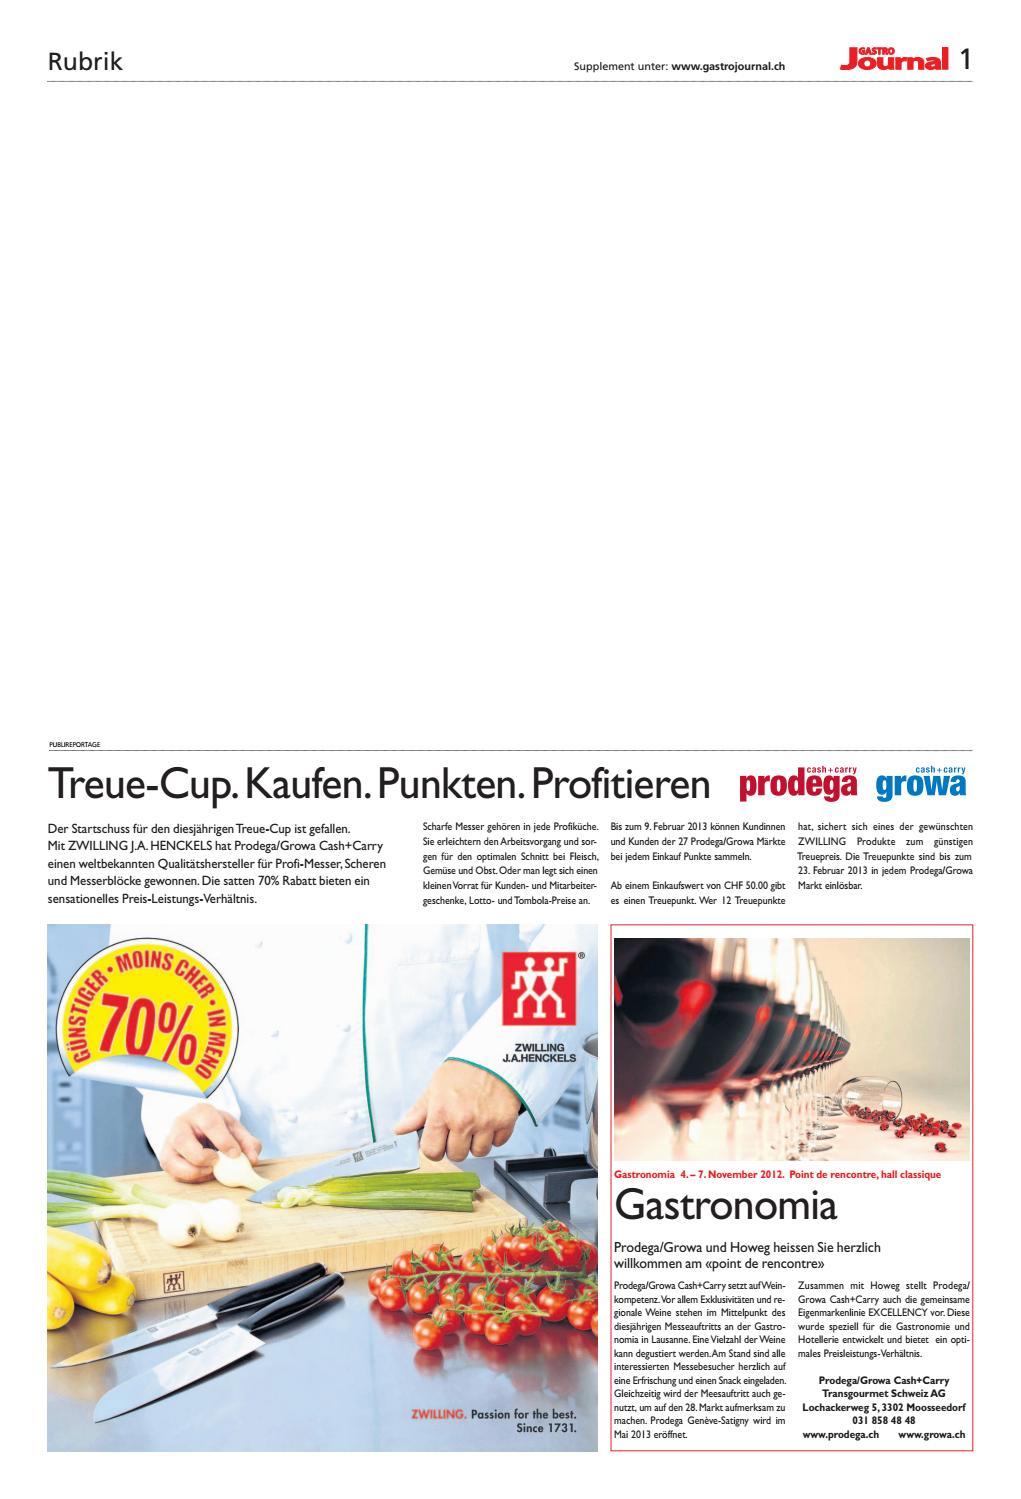 GastroJournal 44/2012 by Gastrojournal - issuu